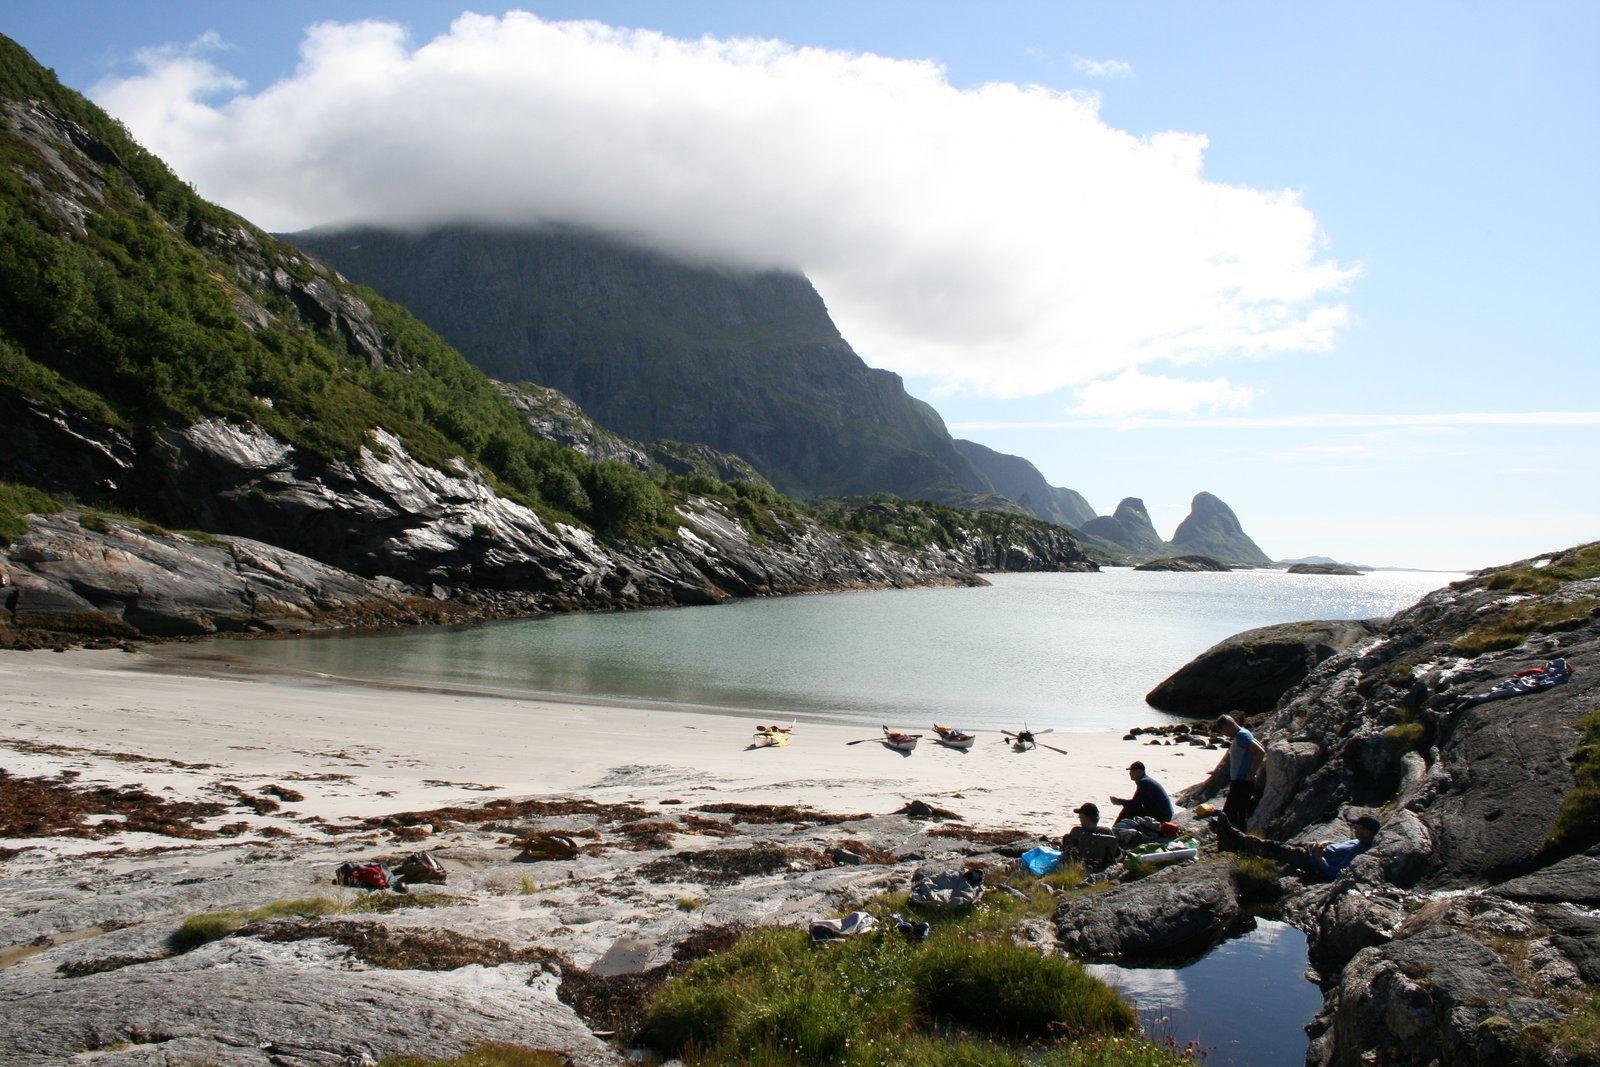 Helgeland Reiseliv,  © Helgeland Reiseliv, Helgeland Reiseliv